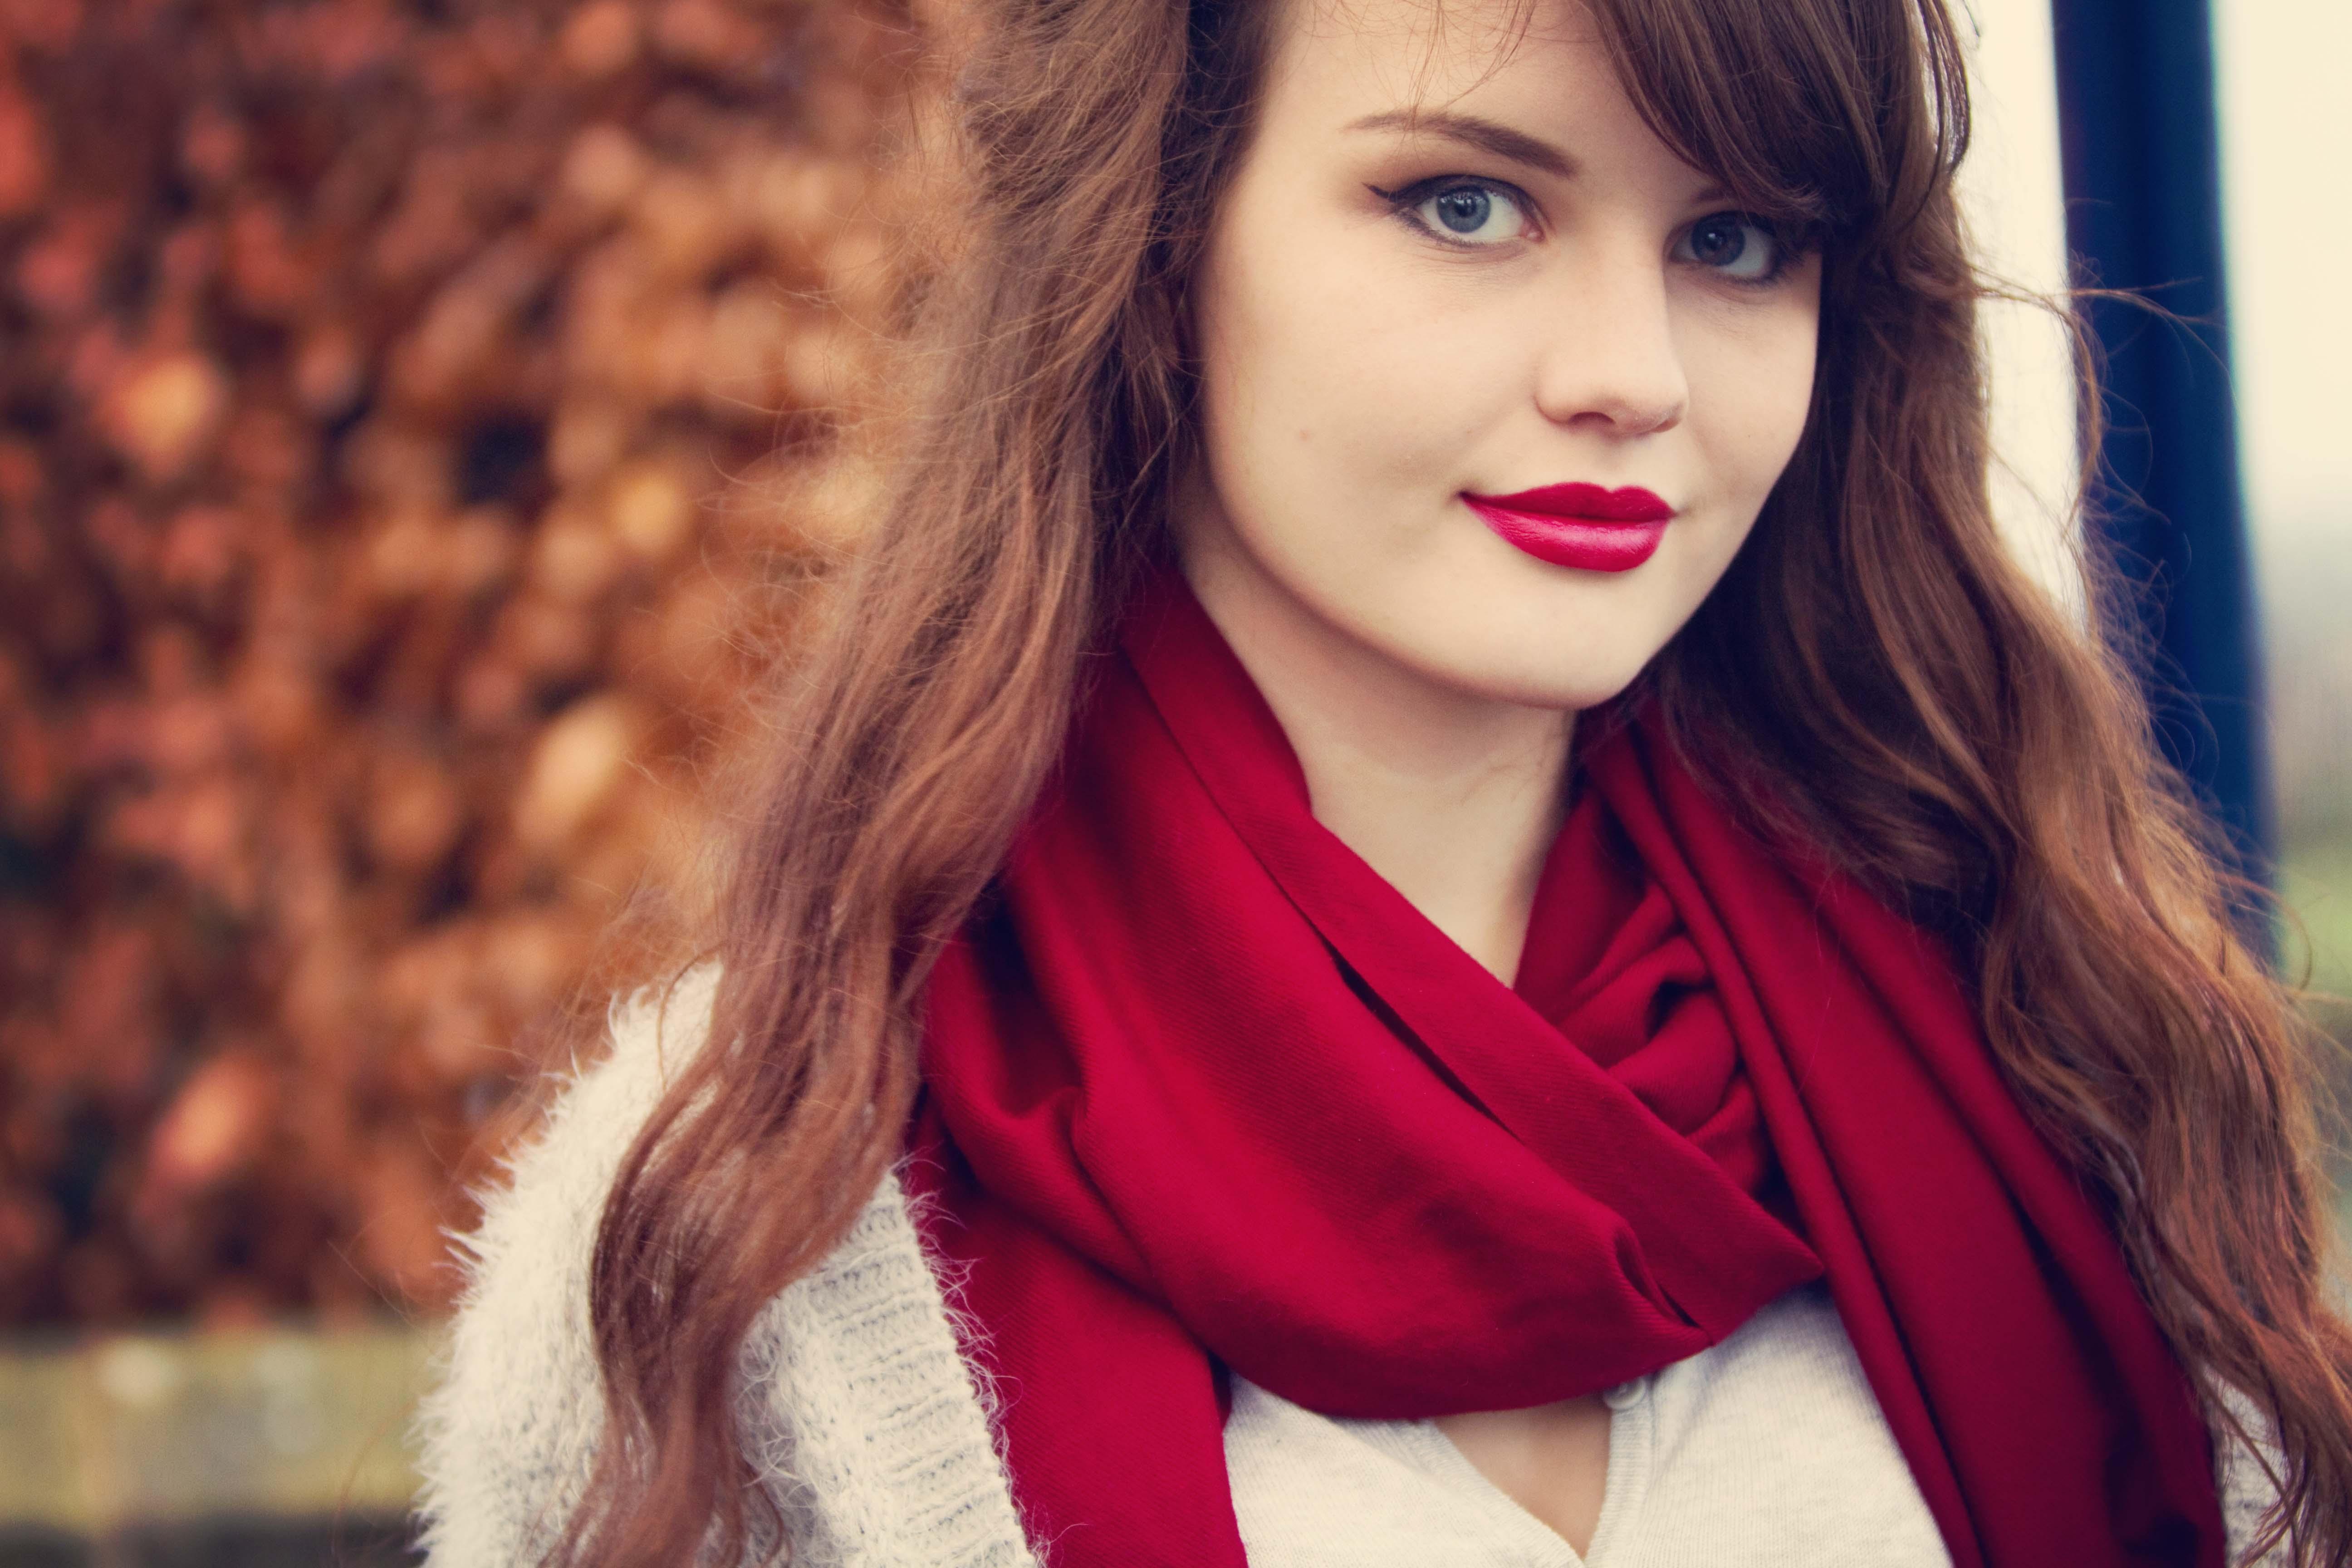 Teenage girl photgraphed against autumnul background